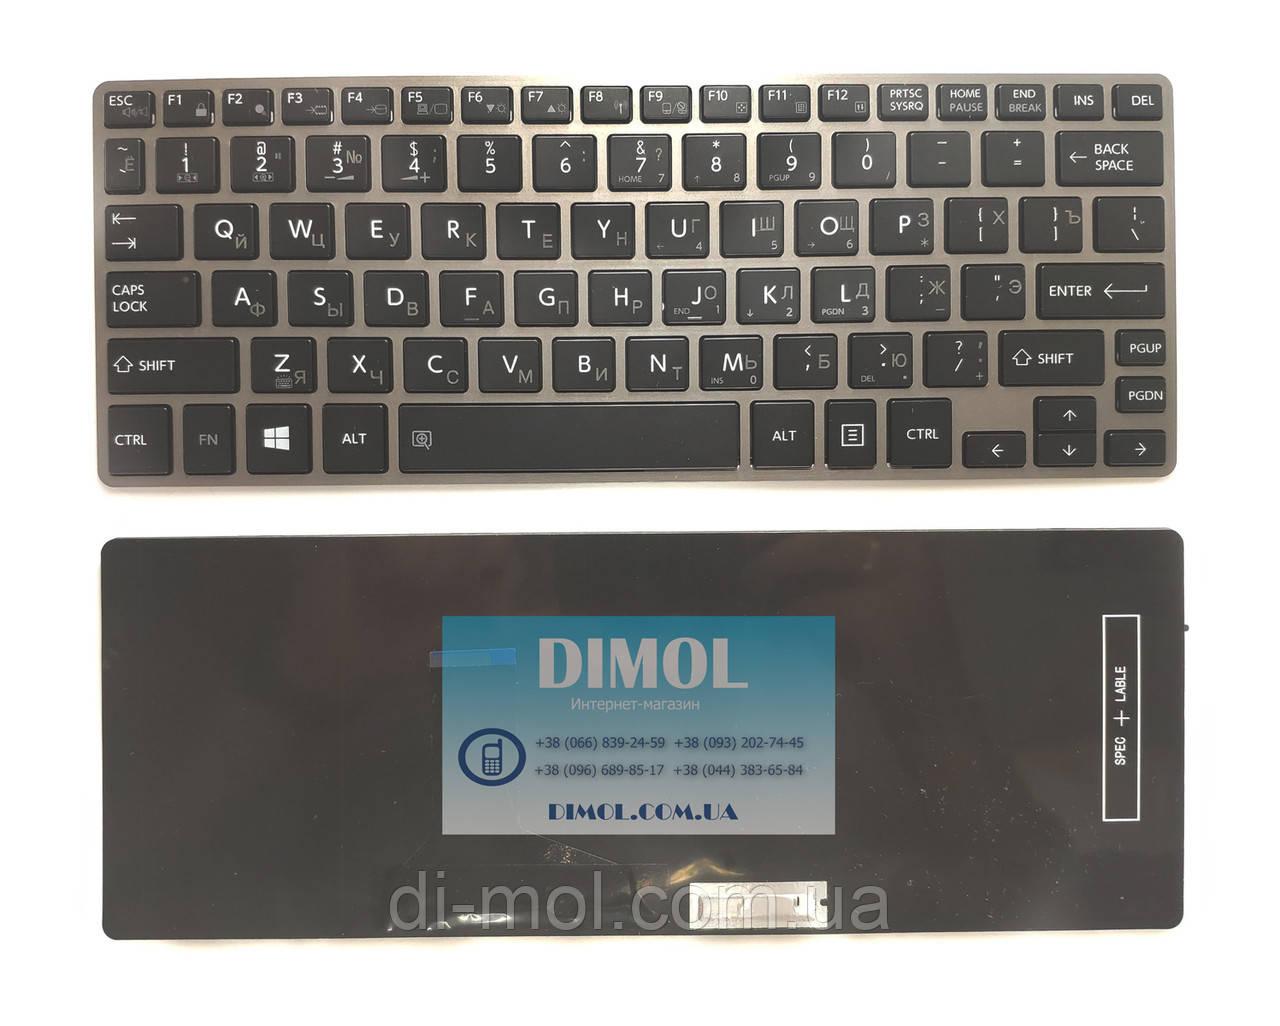 Оригинальная клавиатура для Toshiba Portege Z30, Z30-A, Z30-A1301, Z30-A1301L series, black, ru, серая рамка